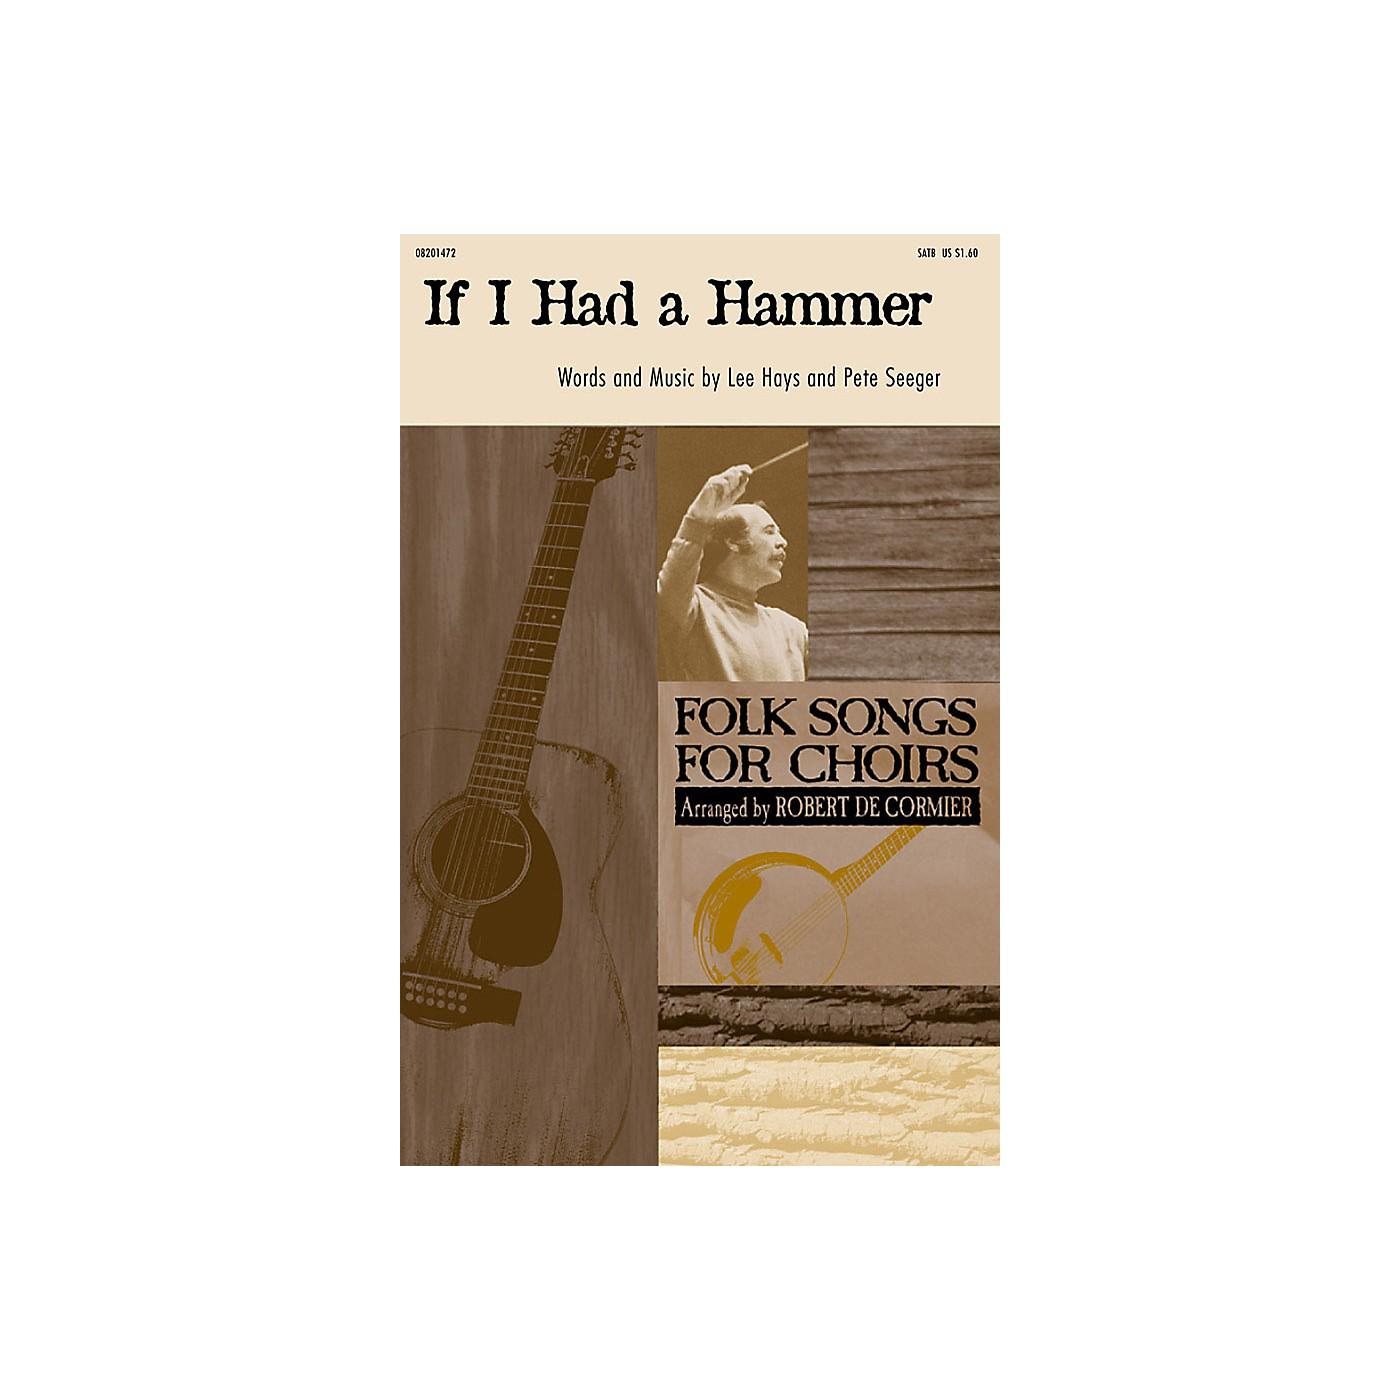 Hal Leonard If I Had a Hammer (The Hammer Song) SATB arranged by Robert DeCormier thumbnail